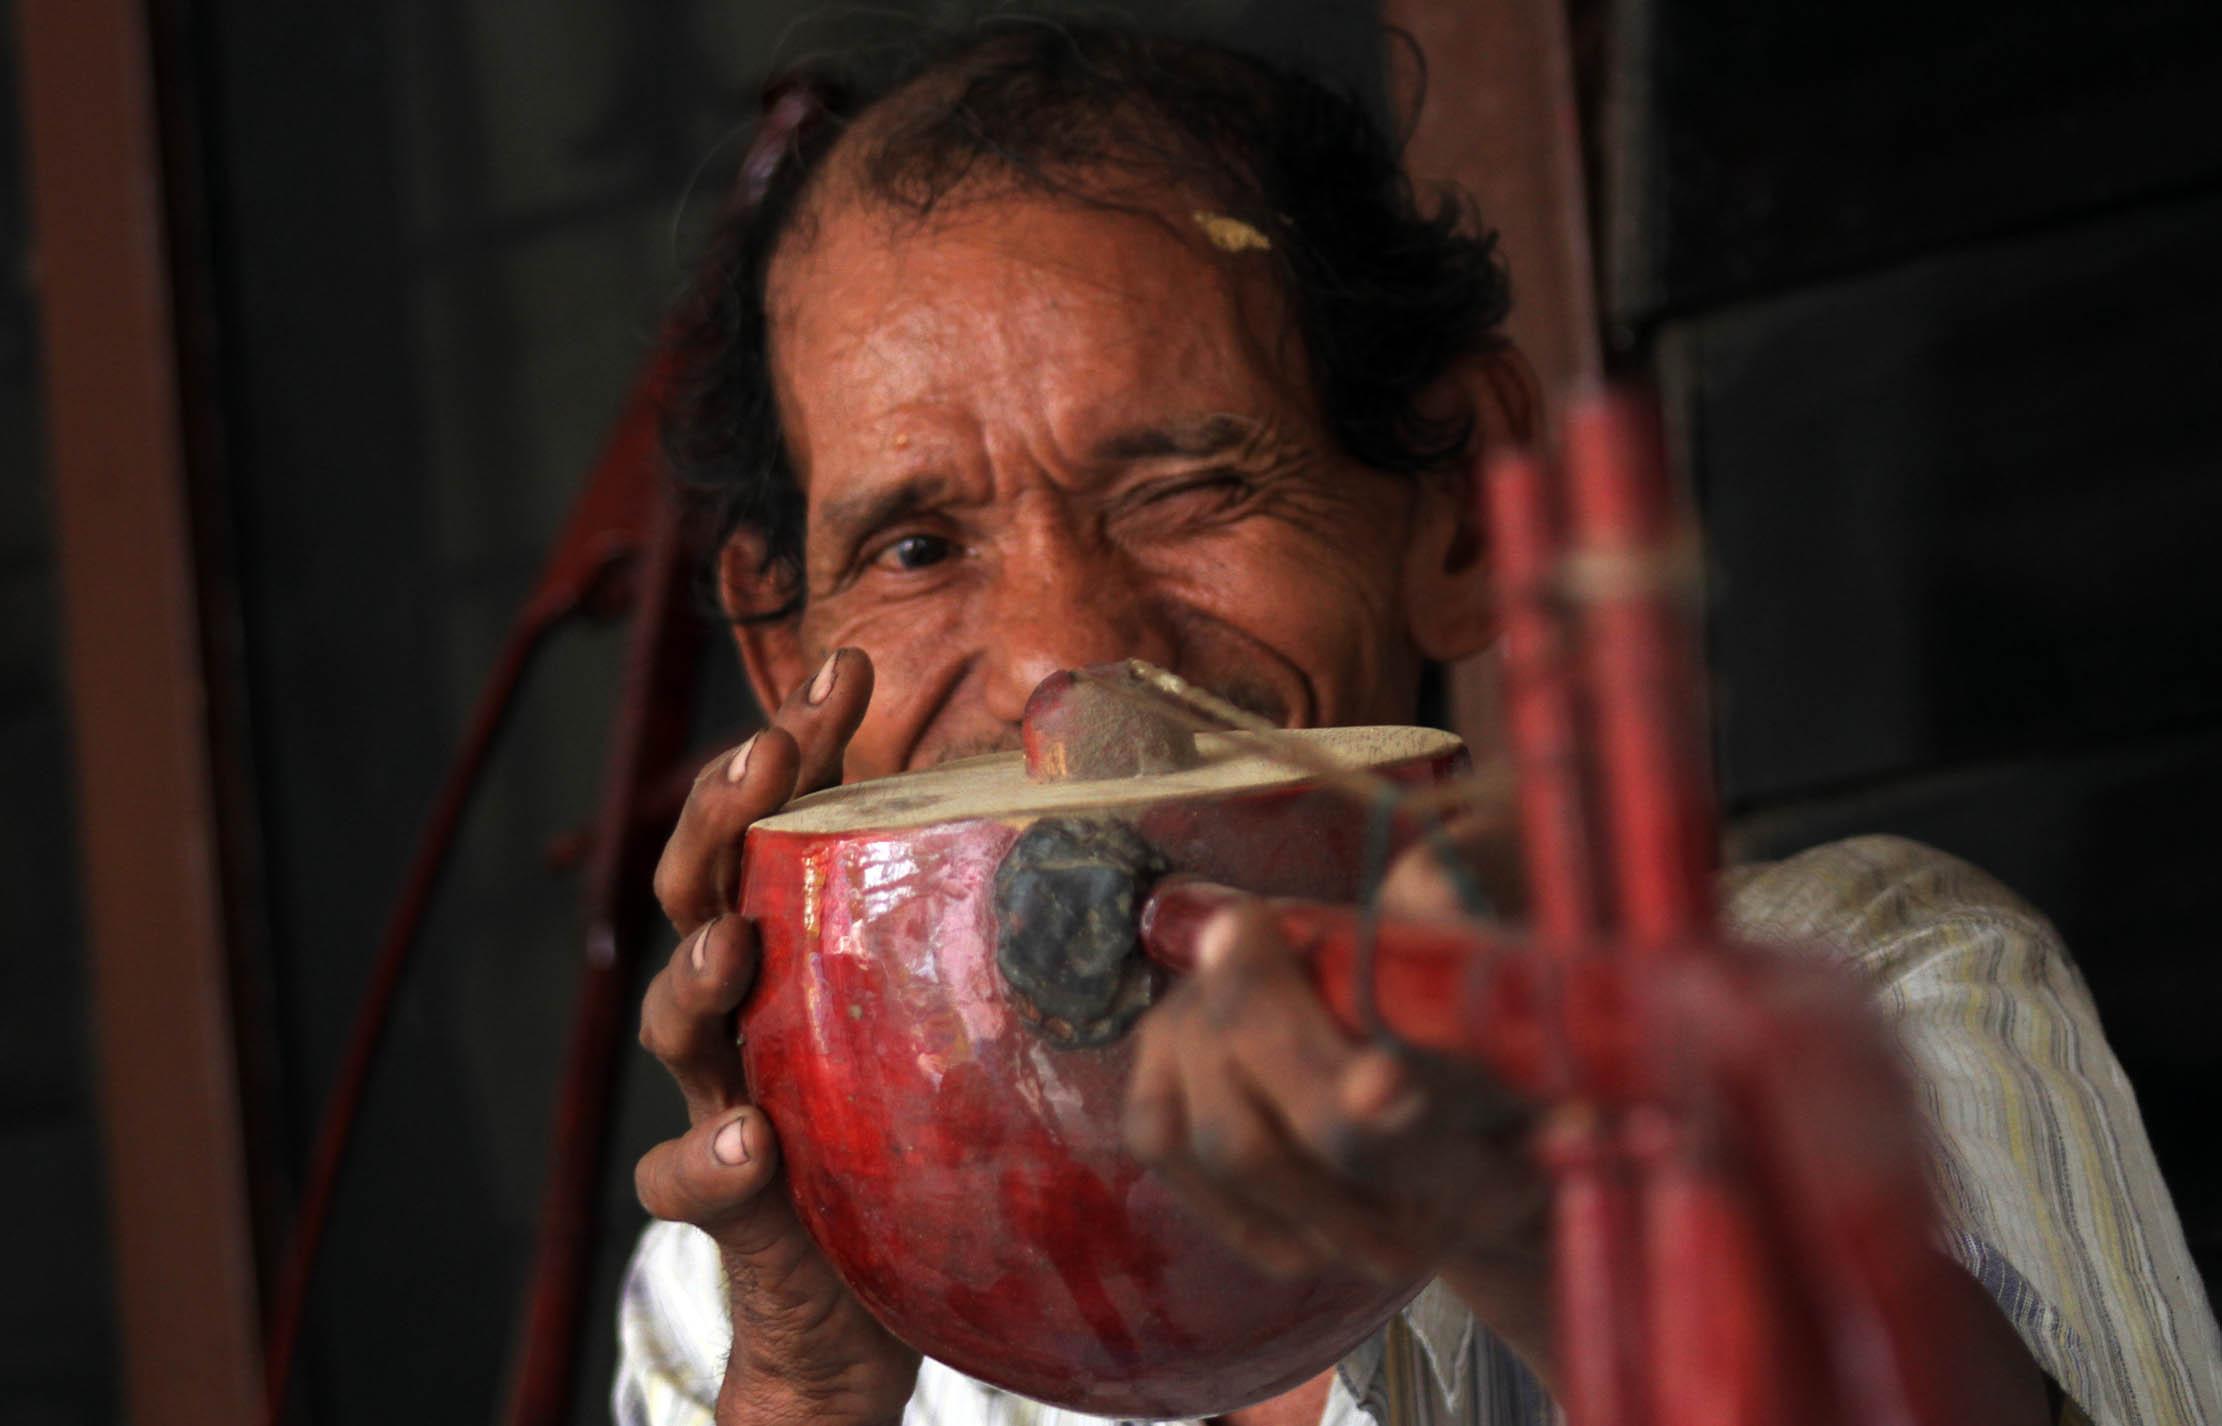 Tehyan, Menjaga Seni Dan Tradisi Leluhur